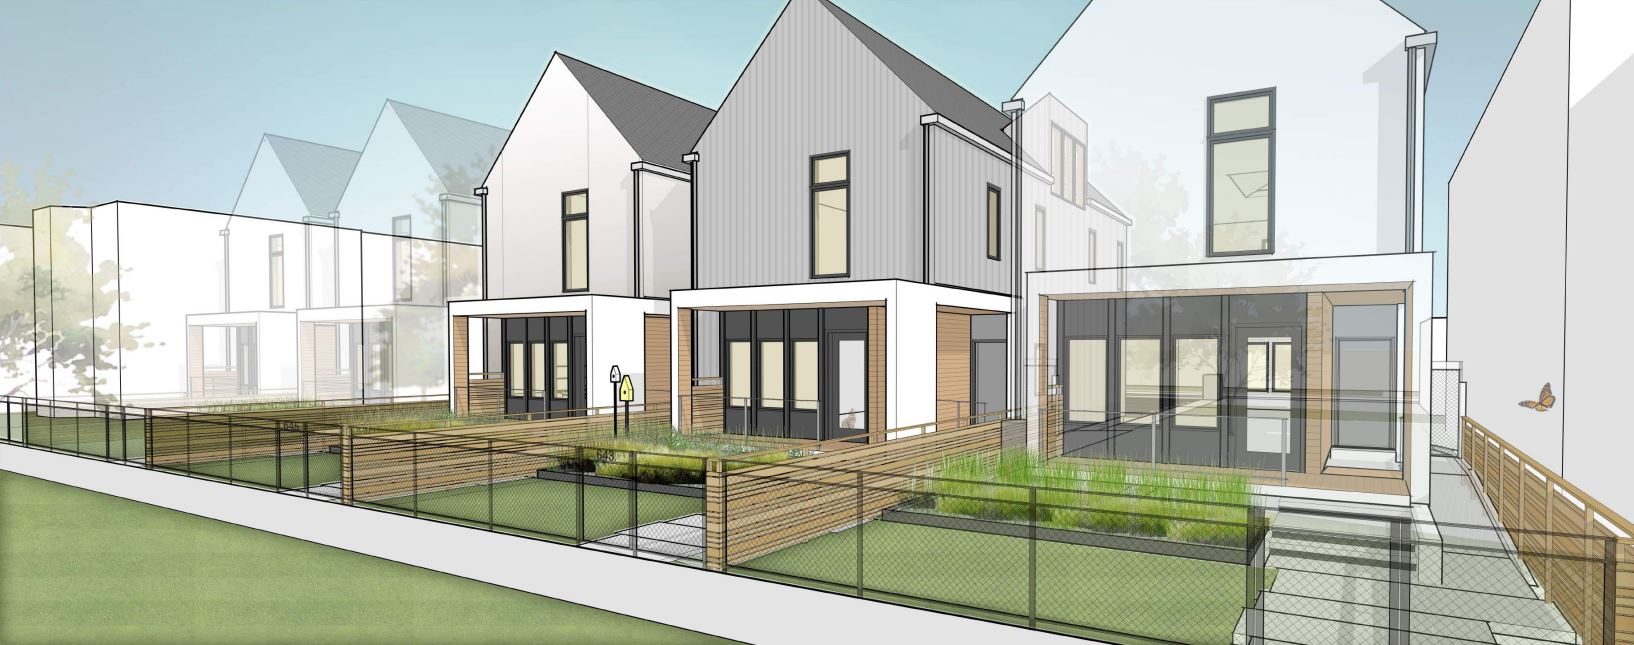 adaptable house rendering